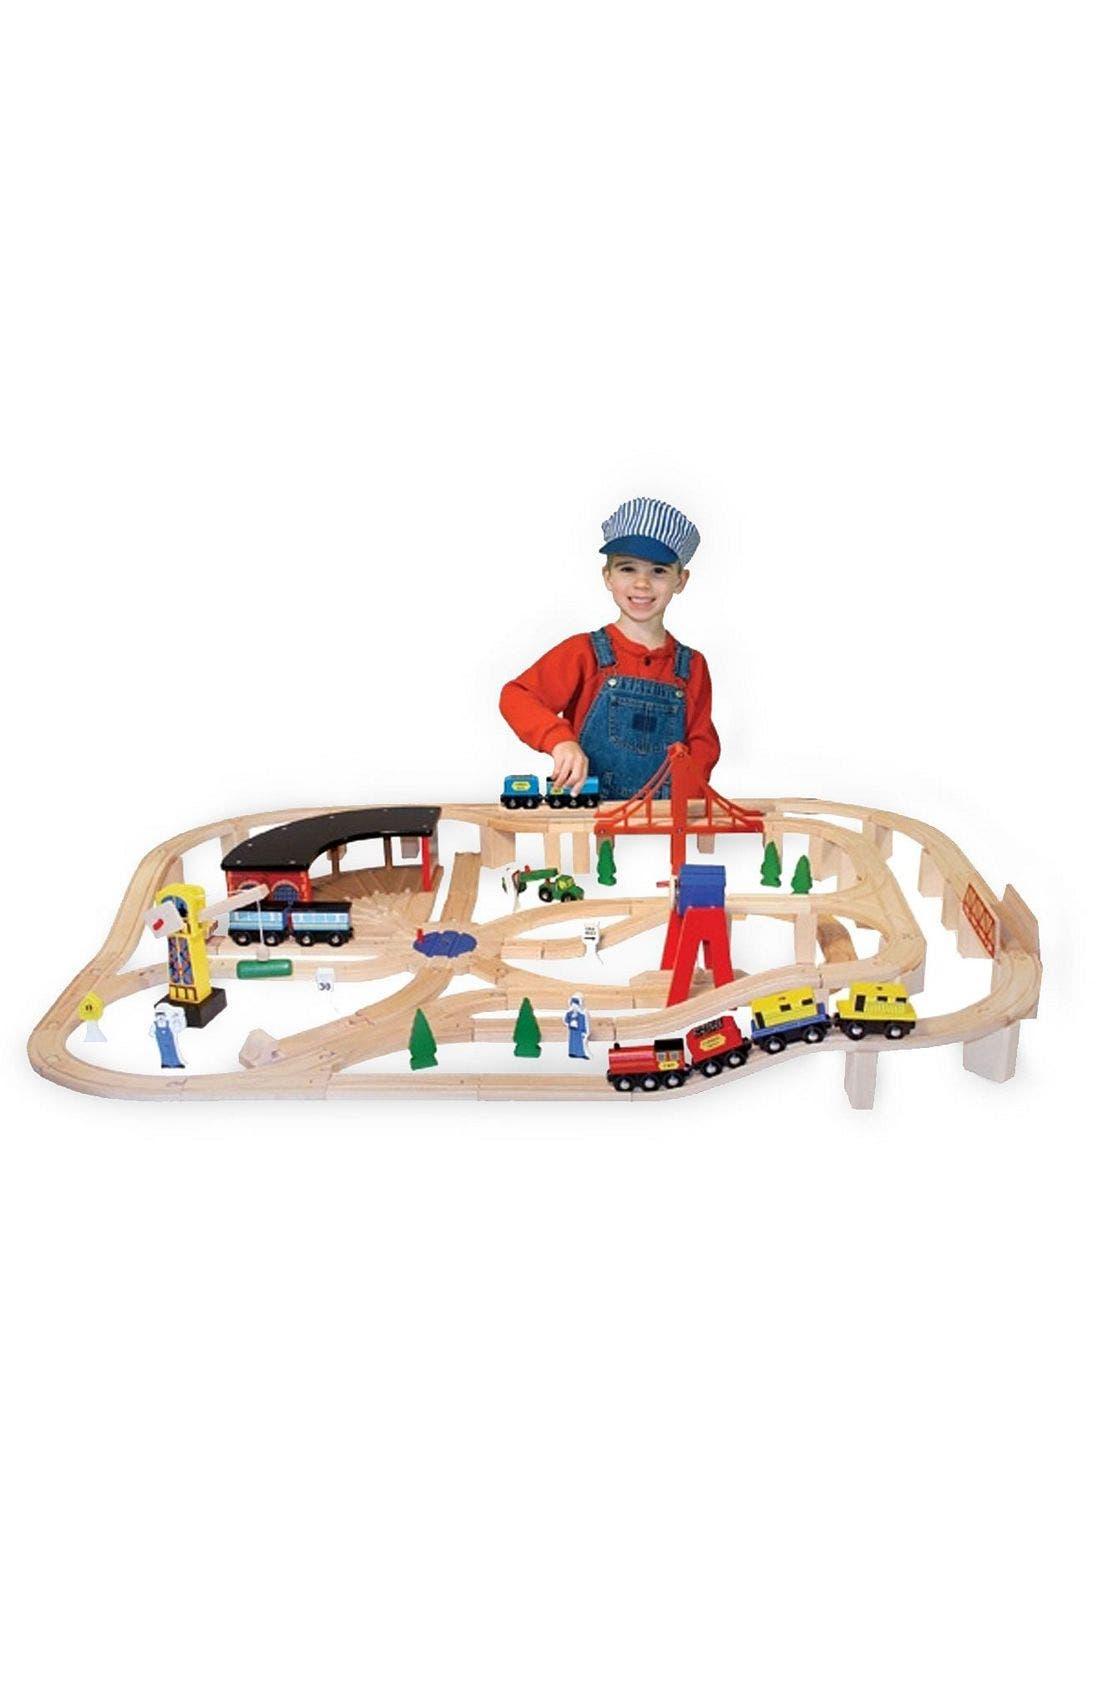 Main Image - Melissa & Doug 132-Piece Wooden Railway Set